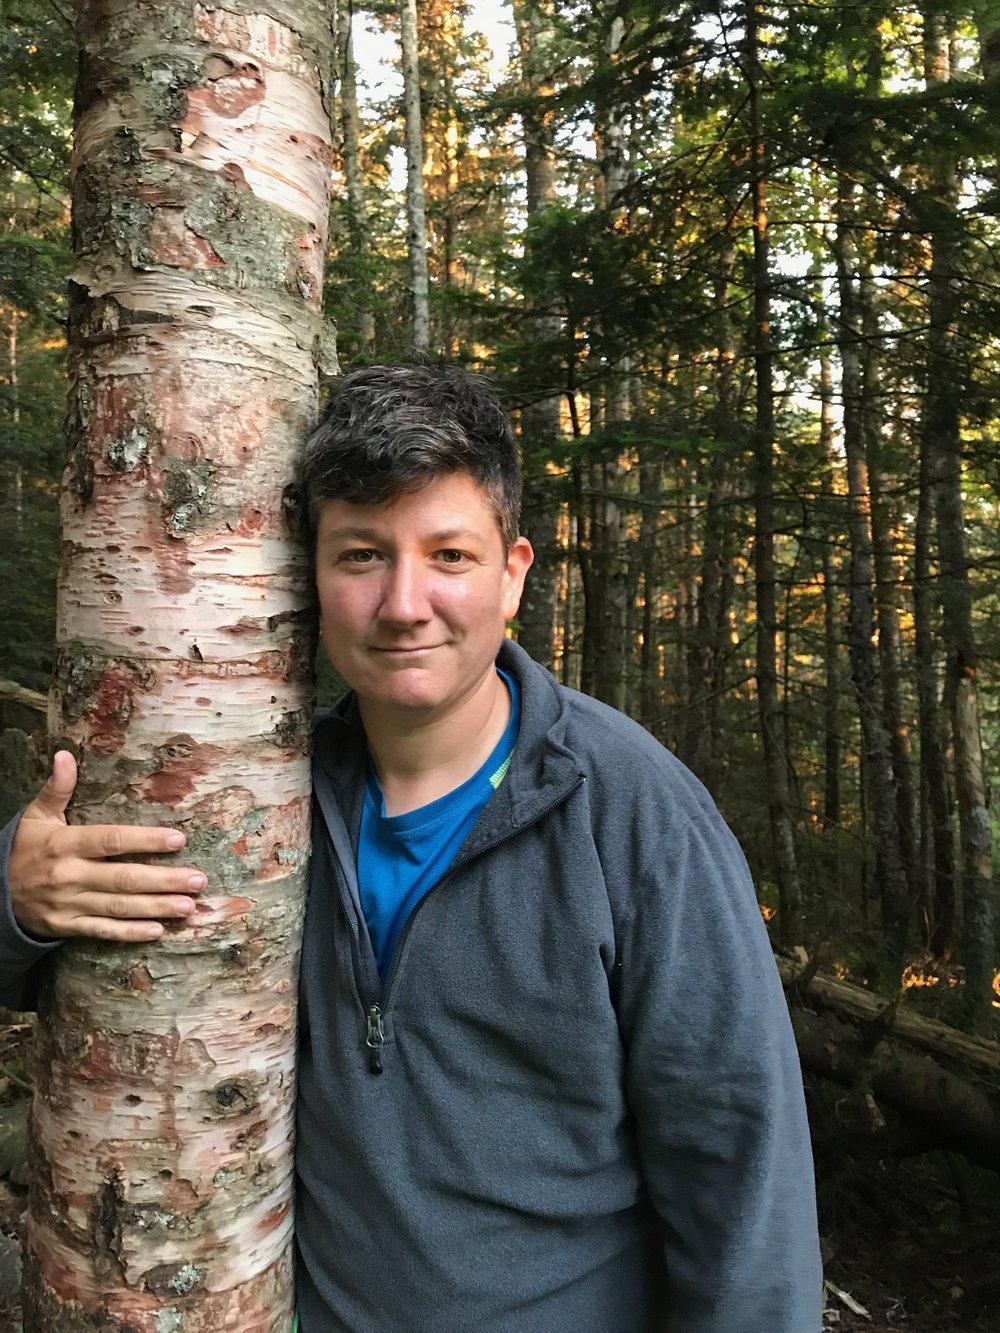 Forest Bathing Retreat w/ Toadstool WalksLyle,WashingtonMay 25-28, 2018 -